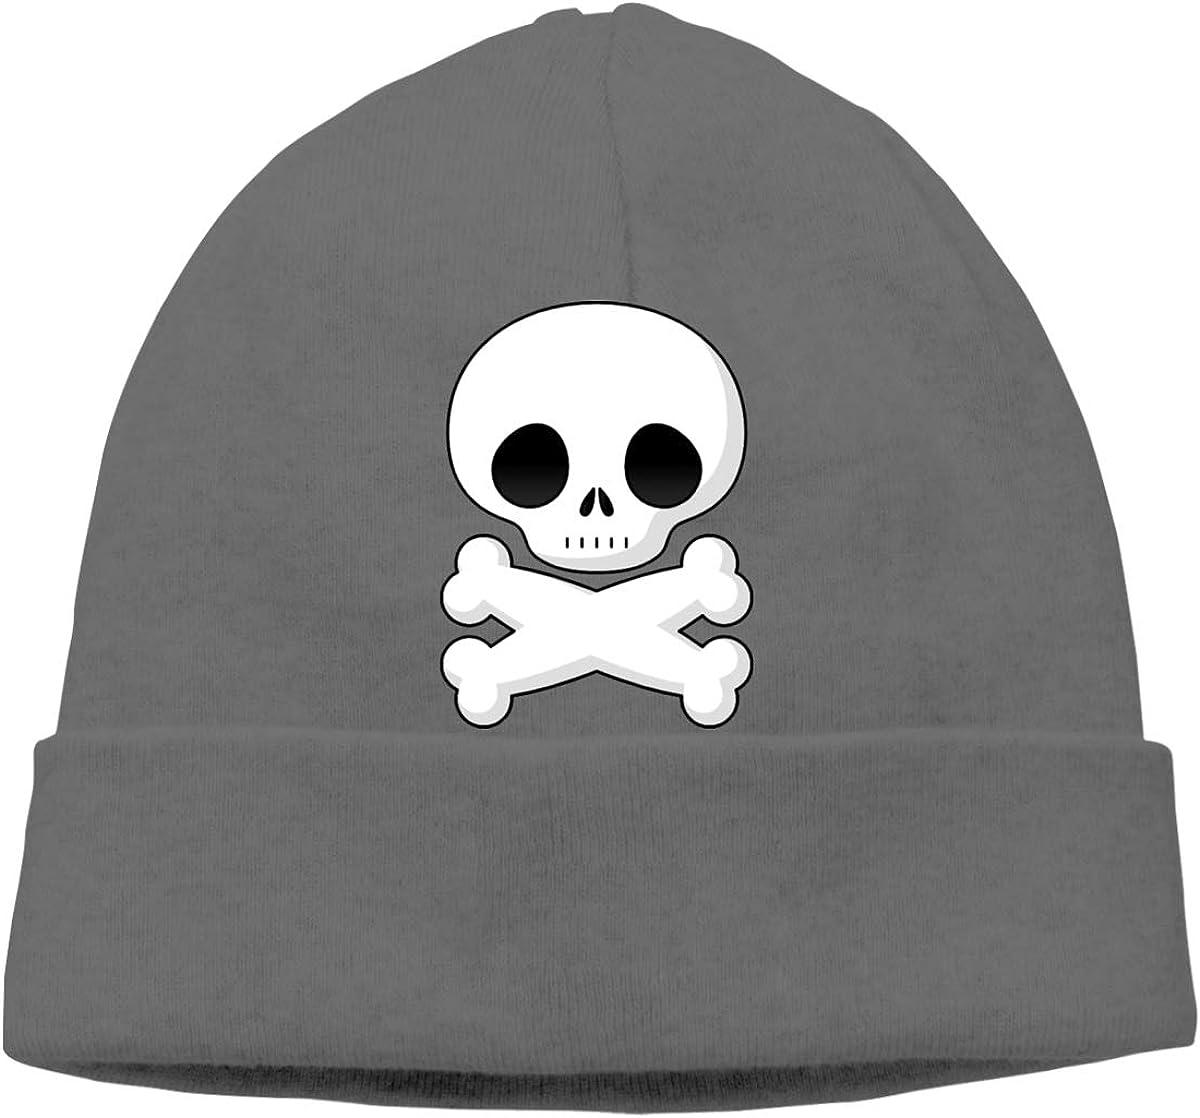 FOECBIR Crossbone and Skull Thin Beanie Hat Skull Hats Men/&Women Slouchy Soft